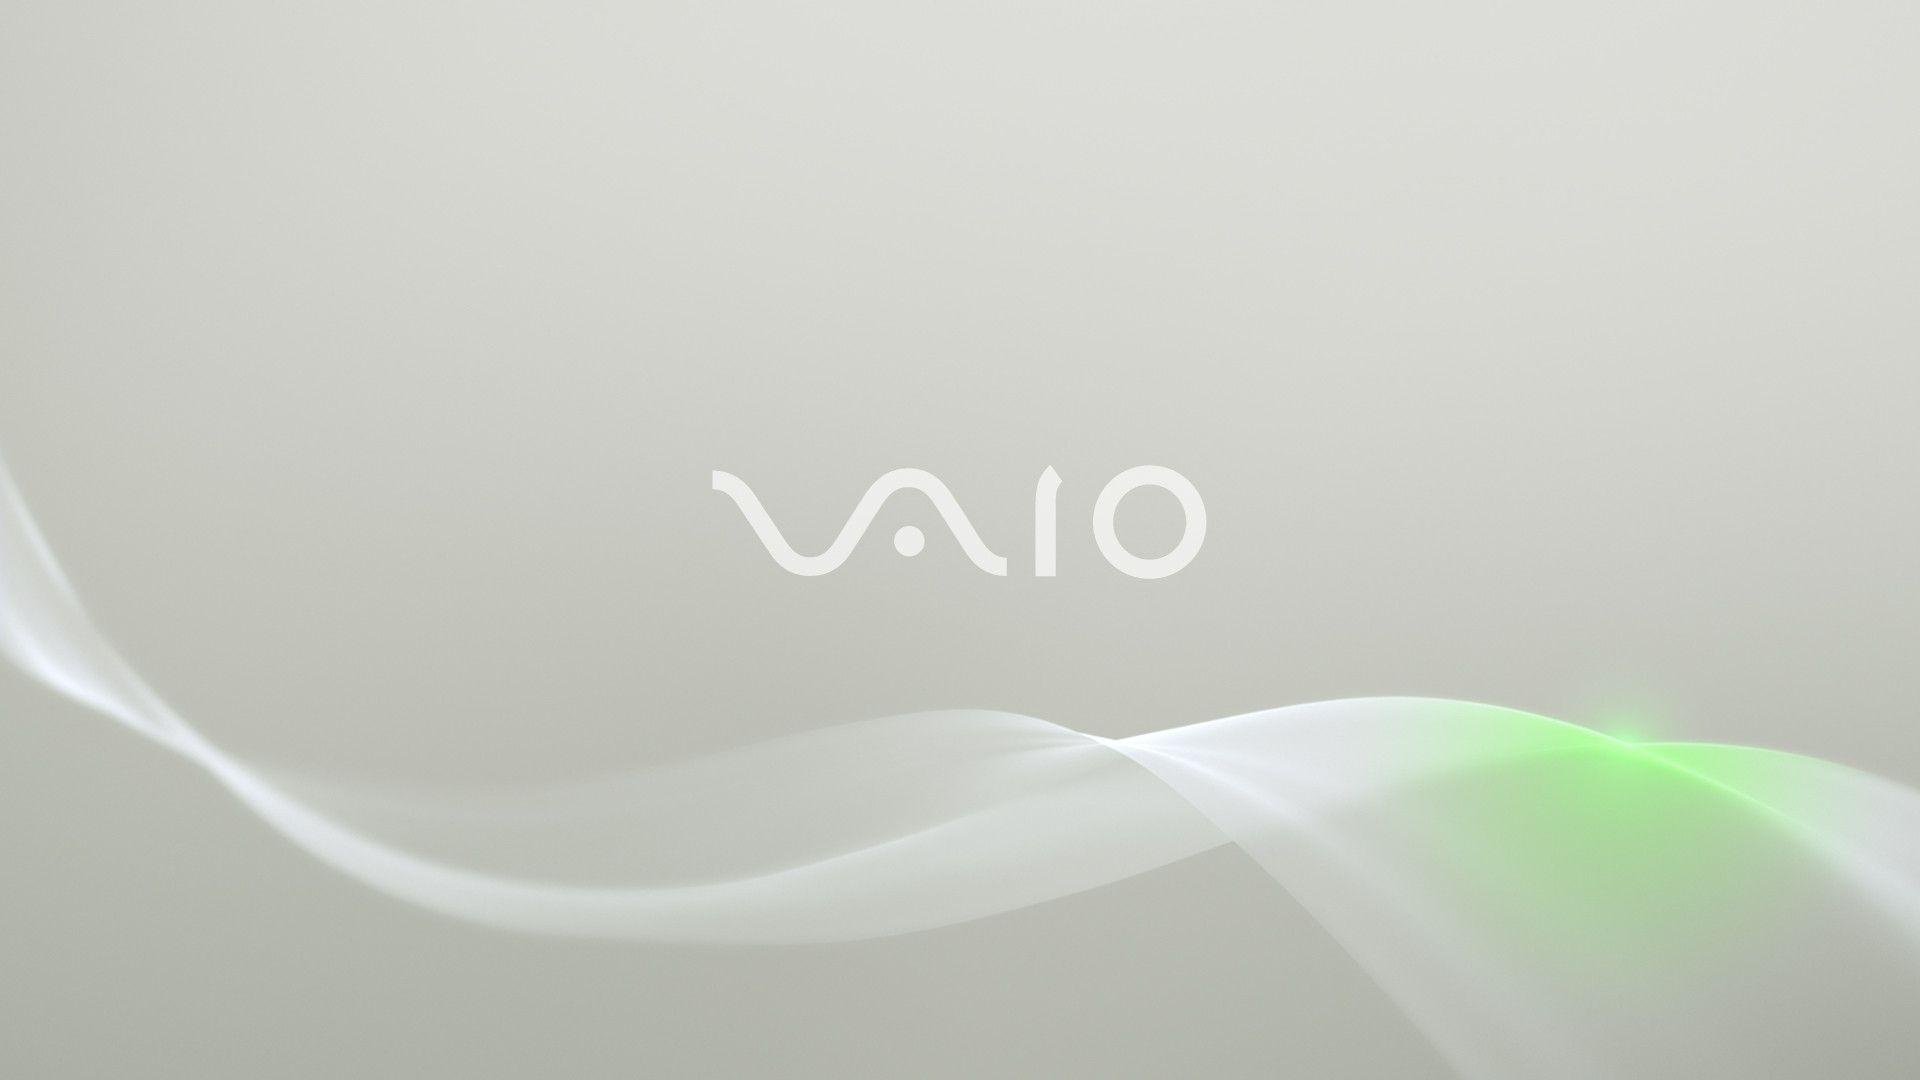 Vaio Wallpapers Wallpaper Cave Wallpaper, Designer